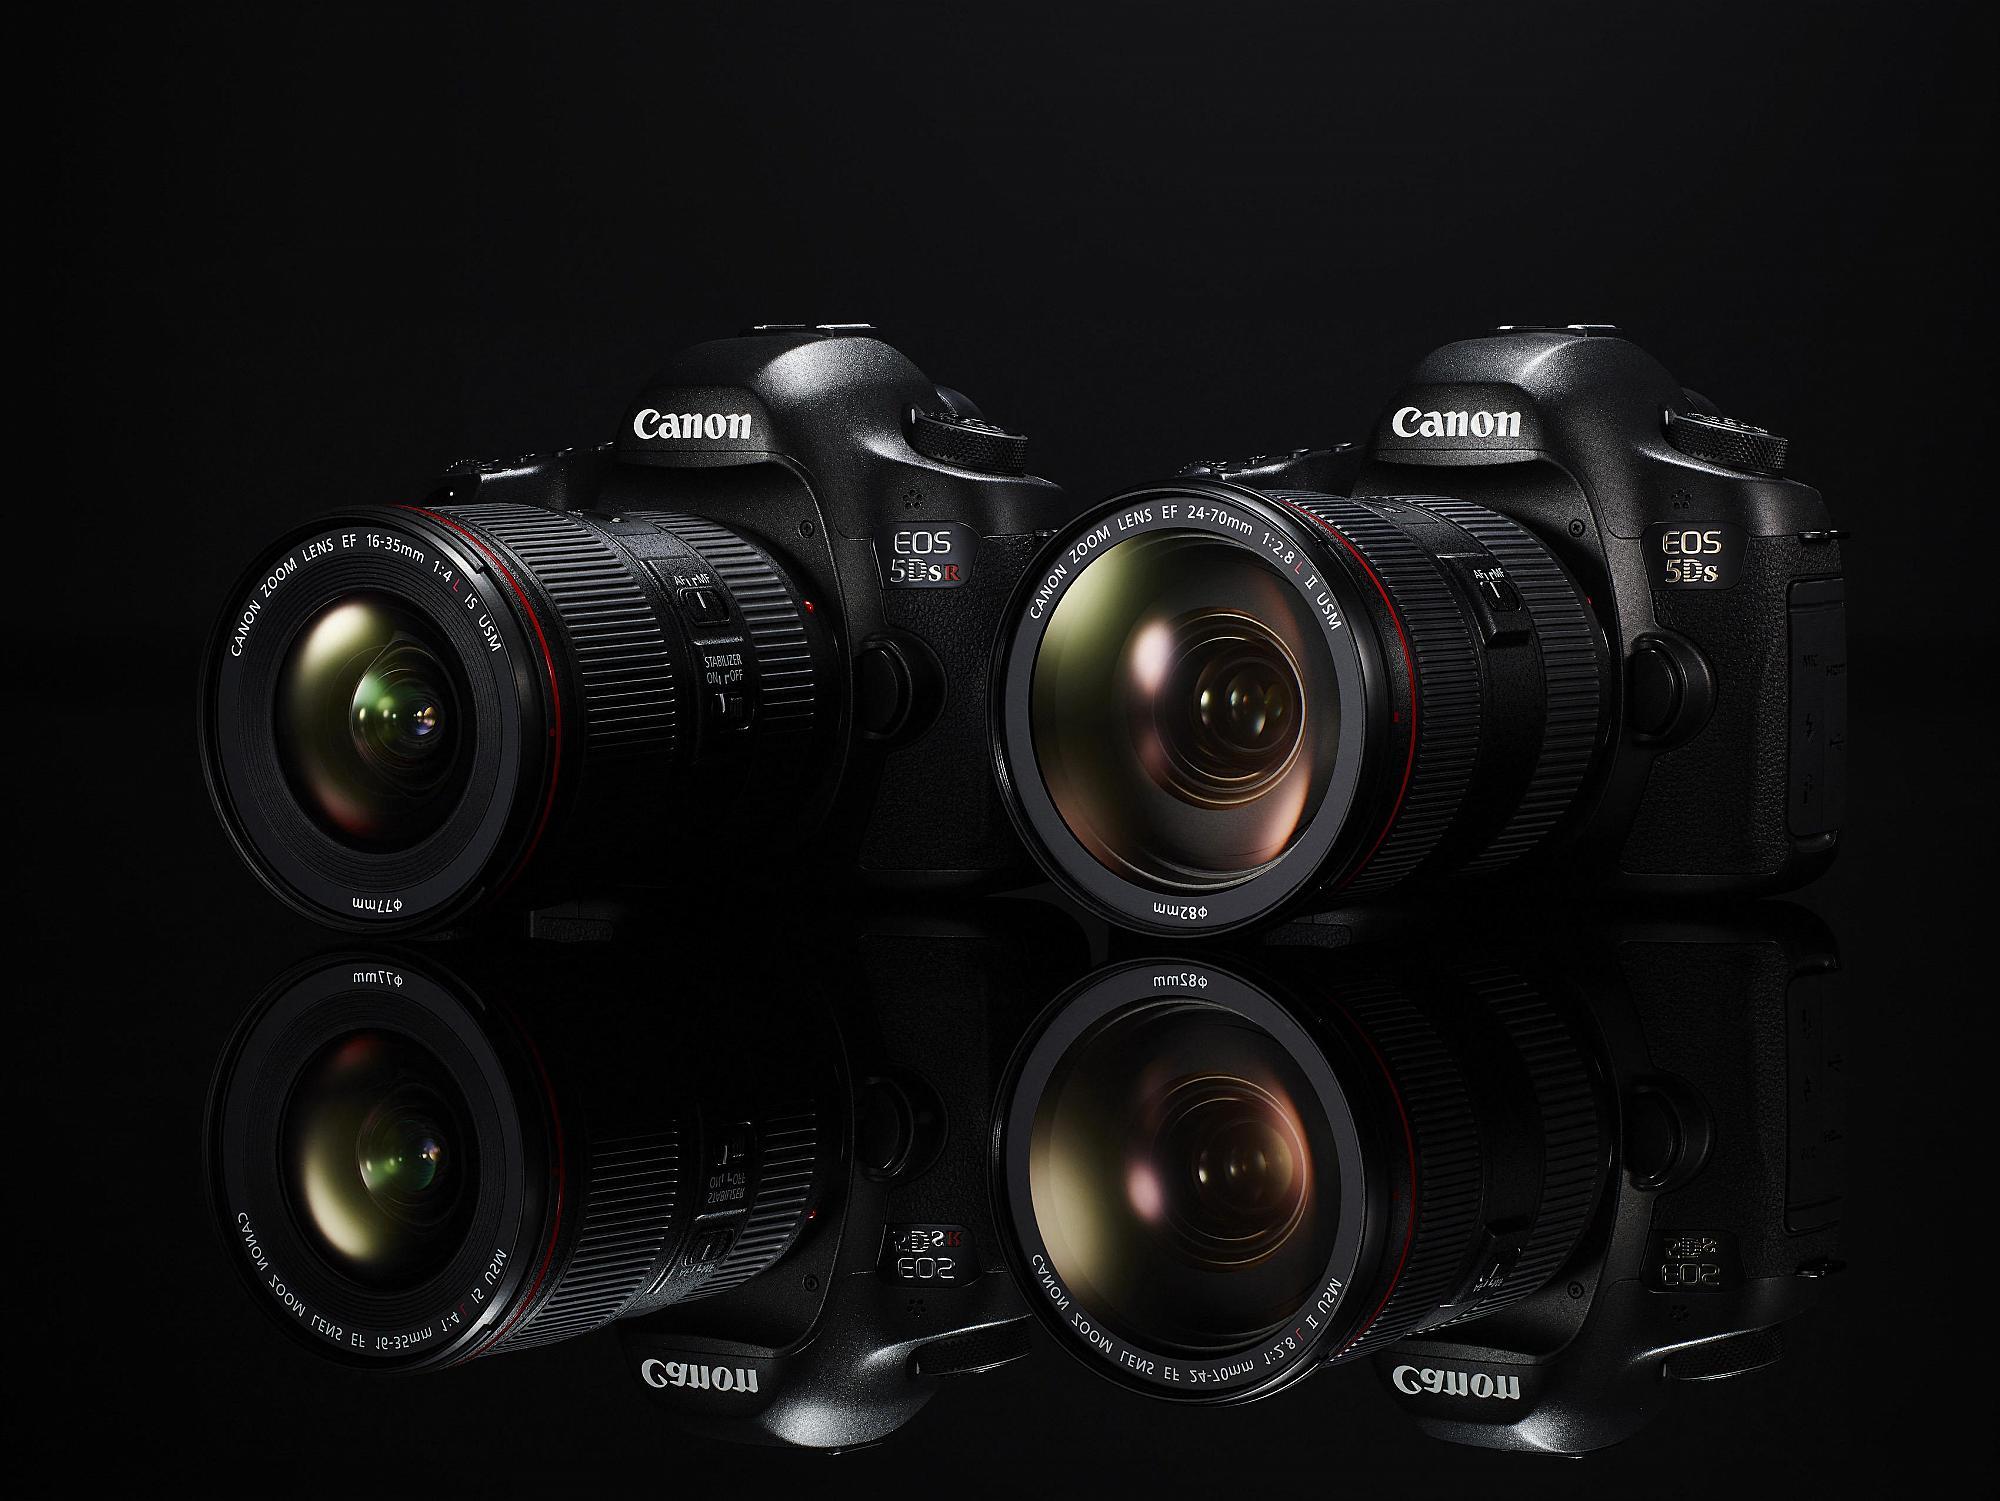 dyraste canon kameran